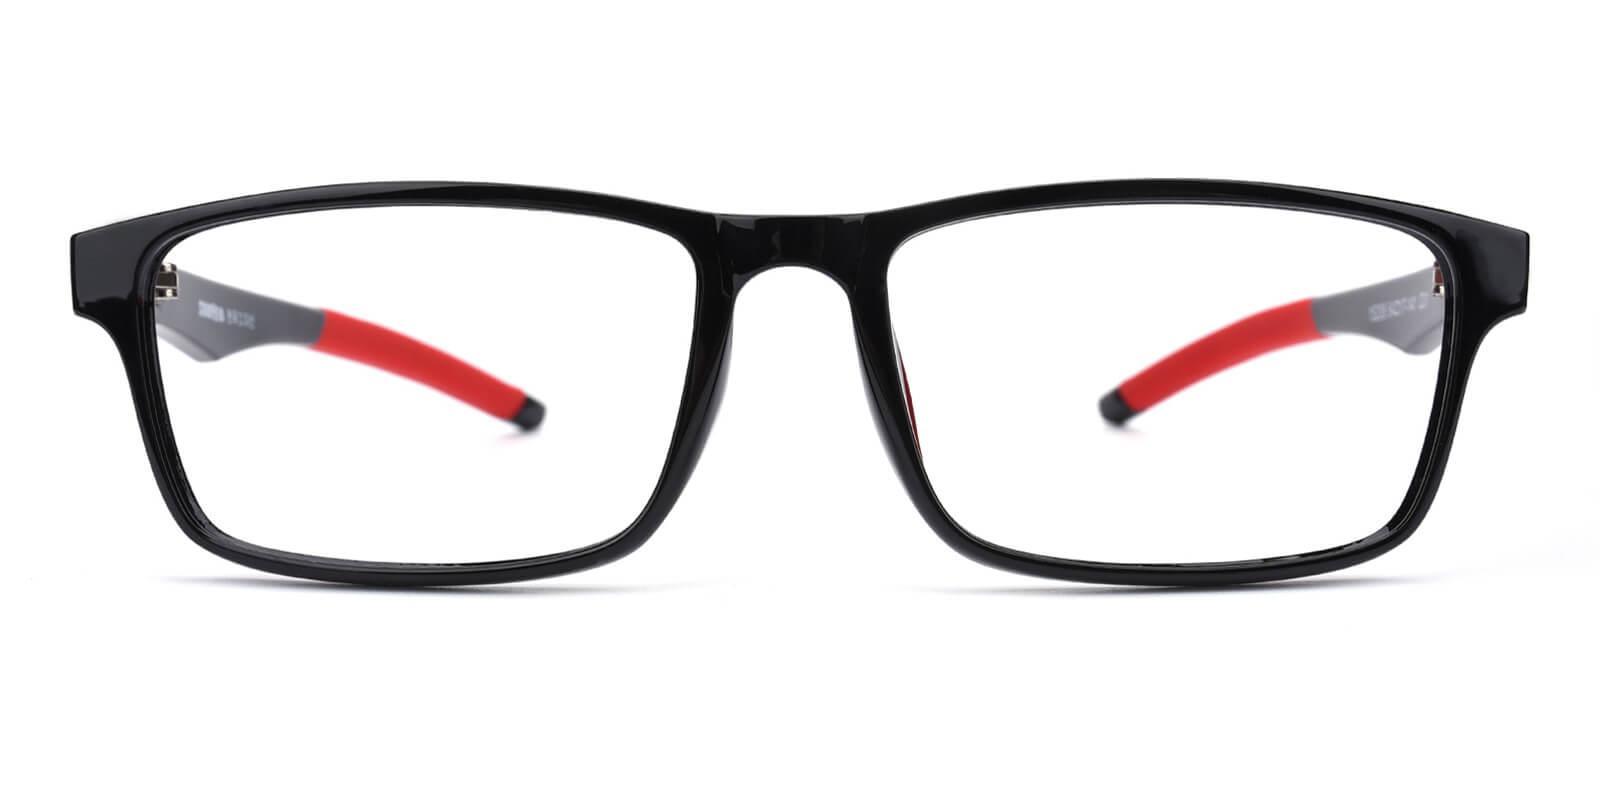 Keionta-Black-Rectangle-TR-SportsGlasses-additional2